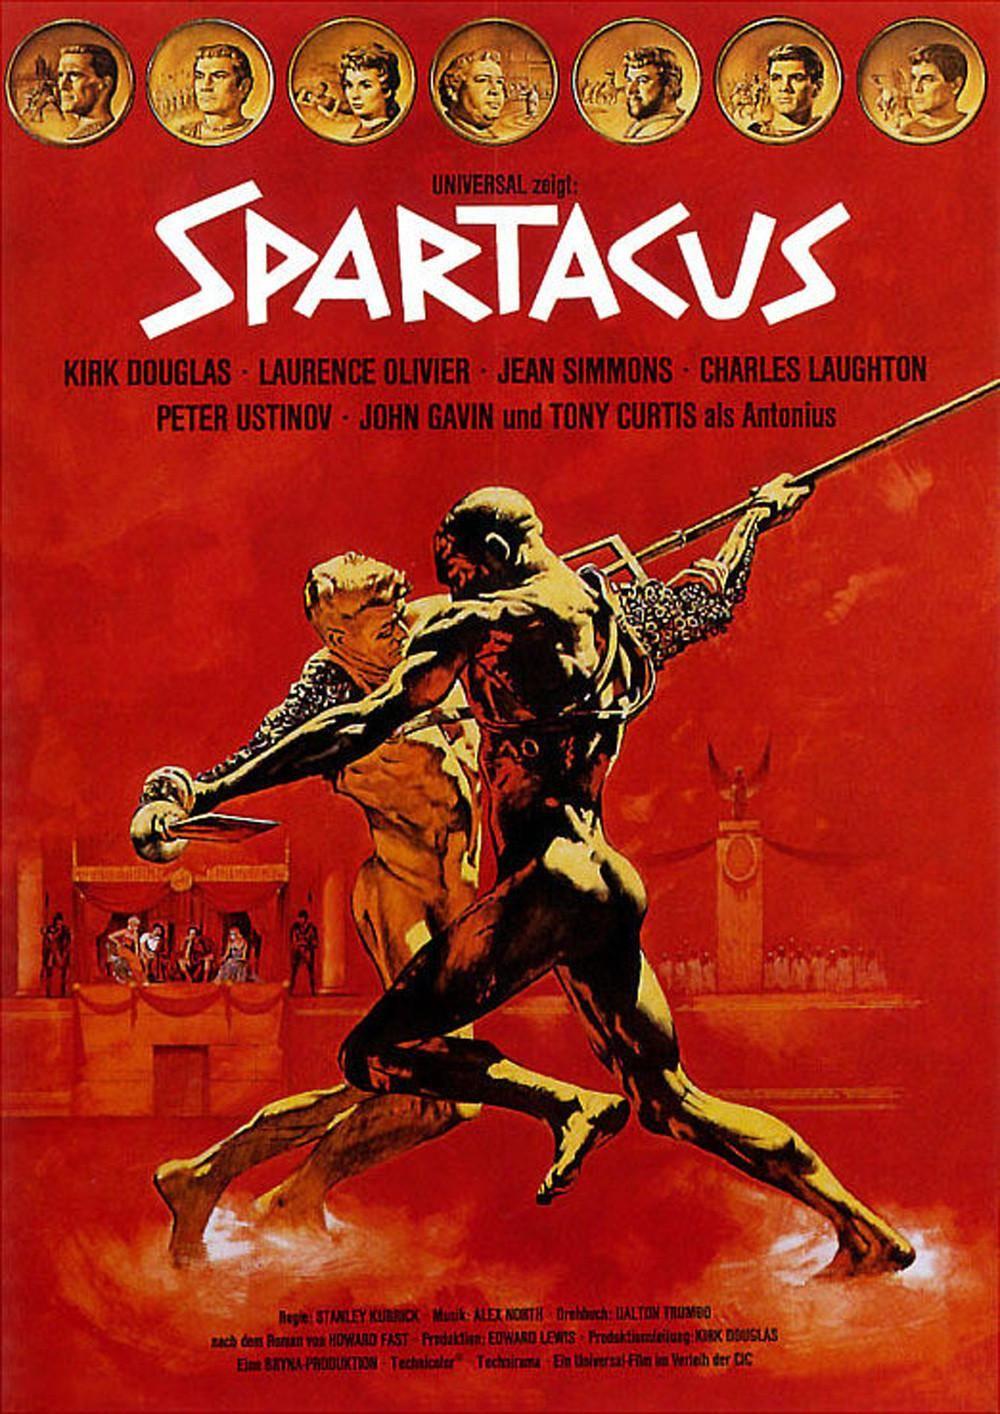 Filme Spartacus with regard to espartaco (spartacus, 1960, stanley kubrick)   posters   pinterest